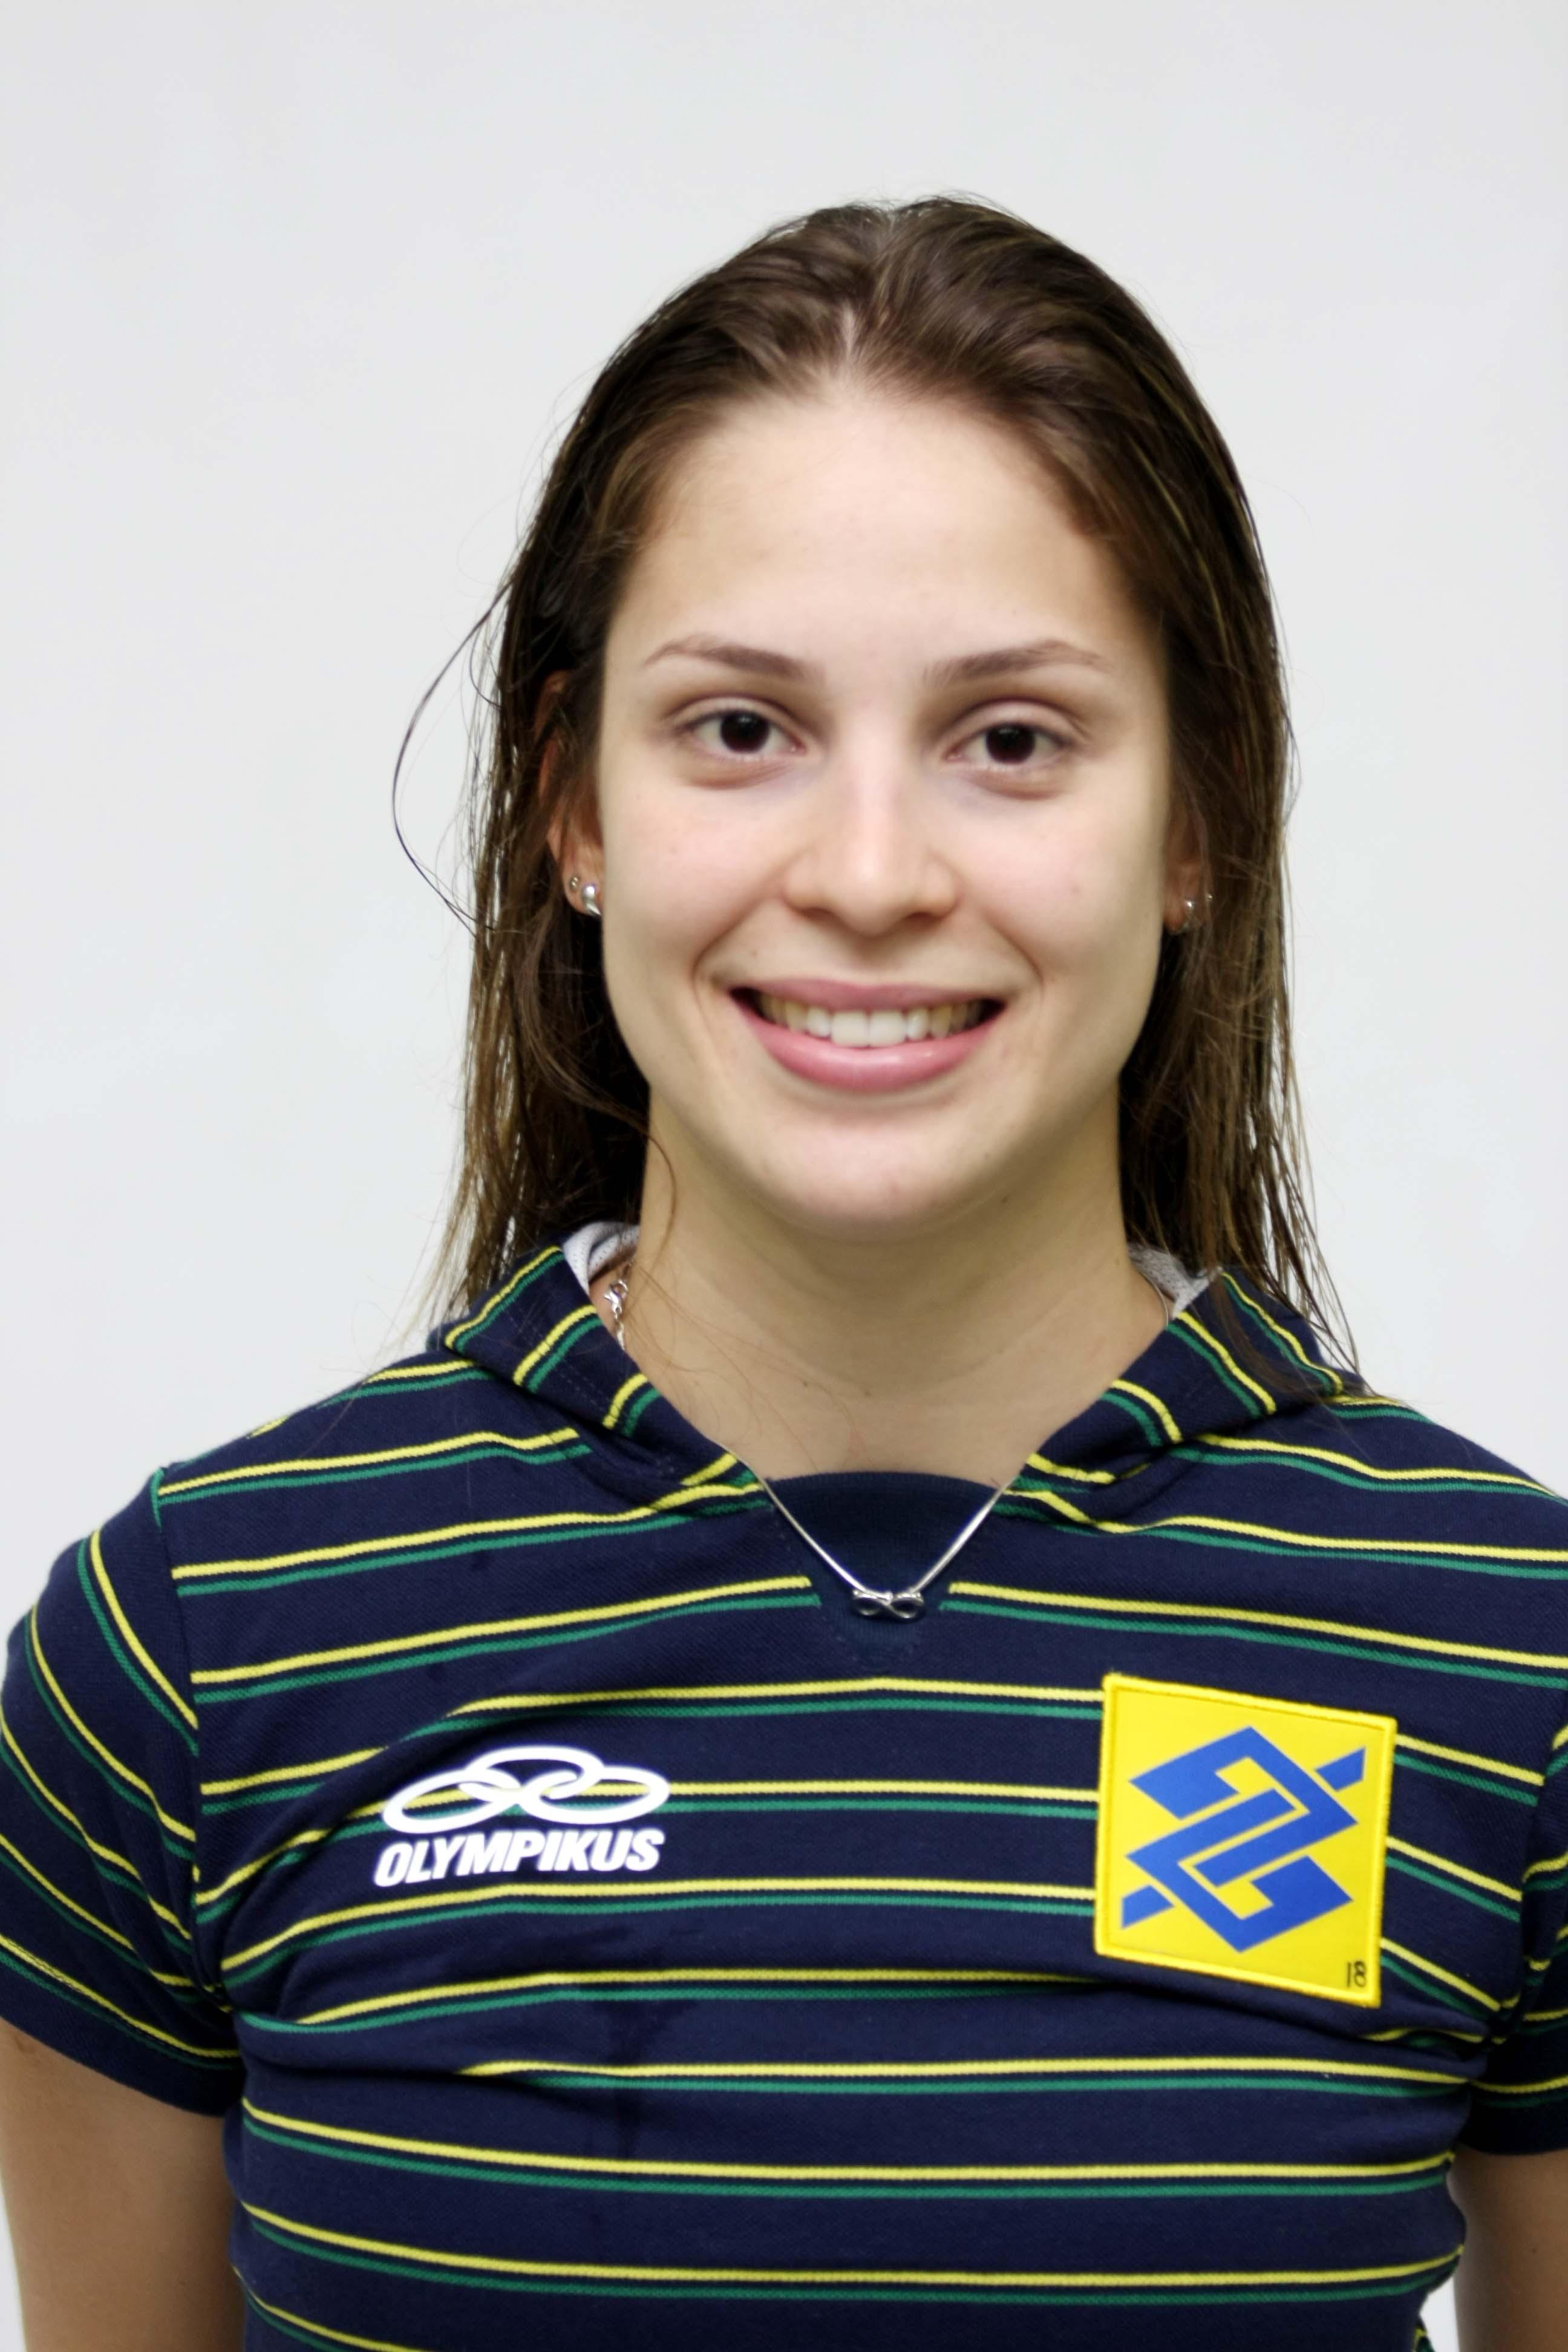 Camila Brait